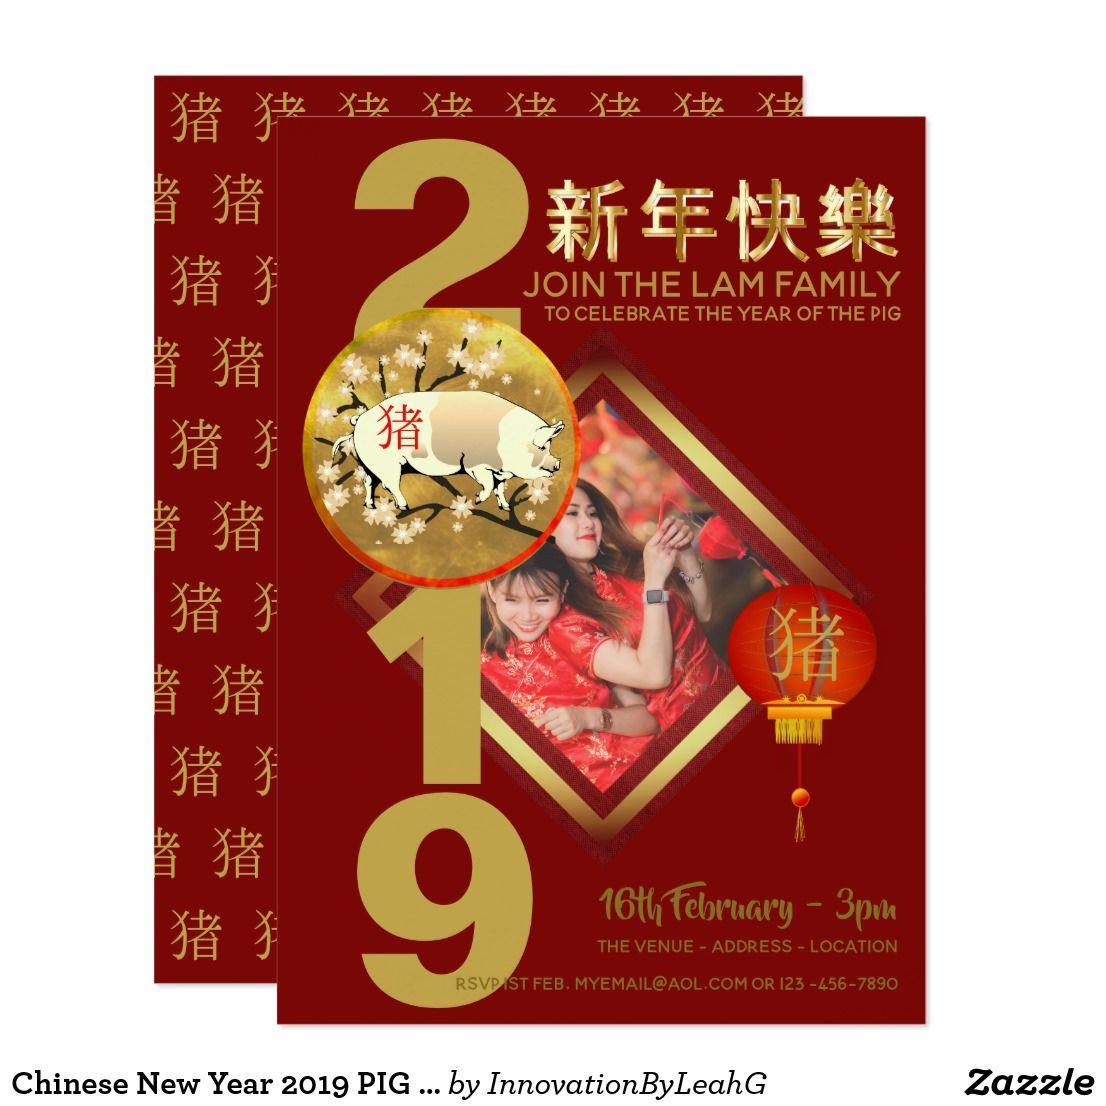 Chinese New Year 2019 PIG Invitation - ADD PHOTO